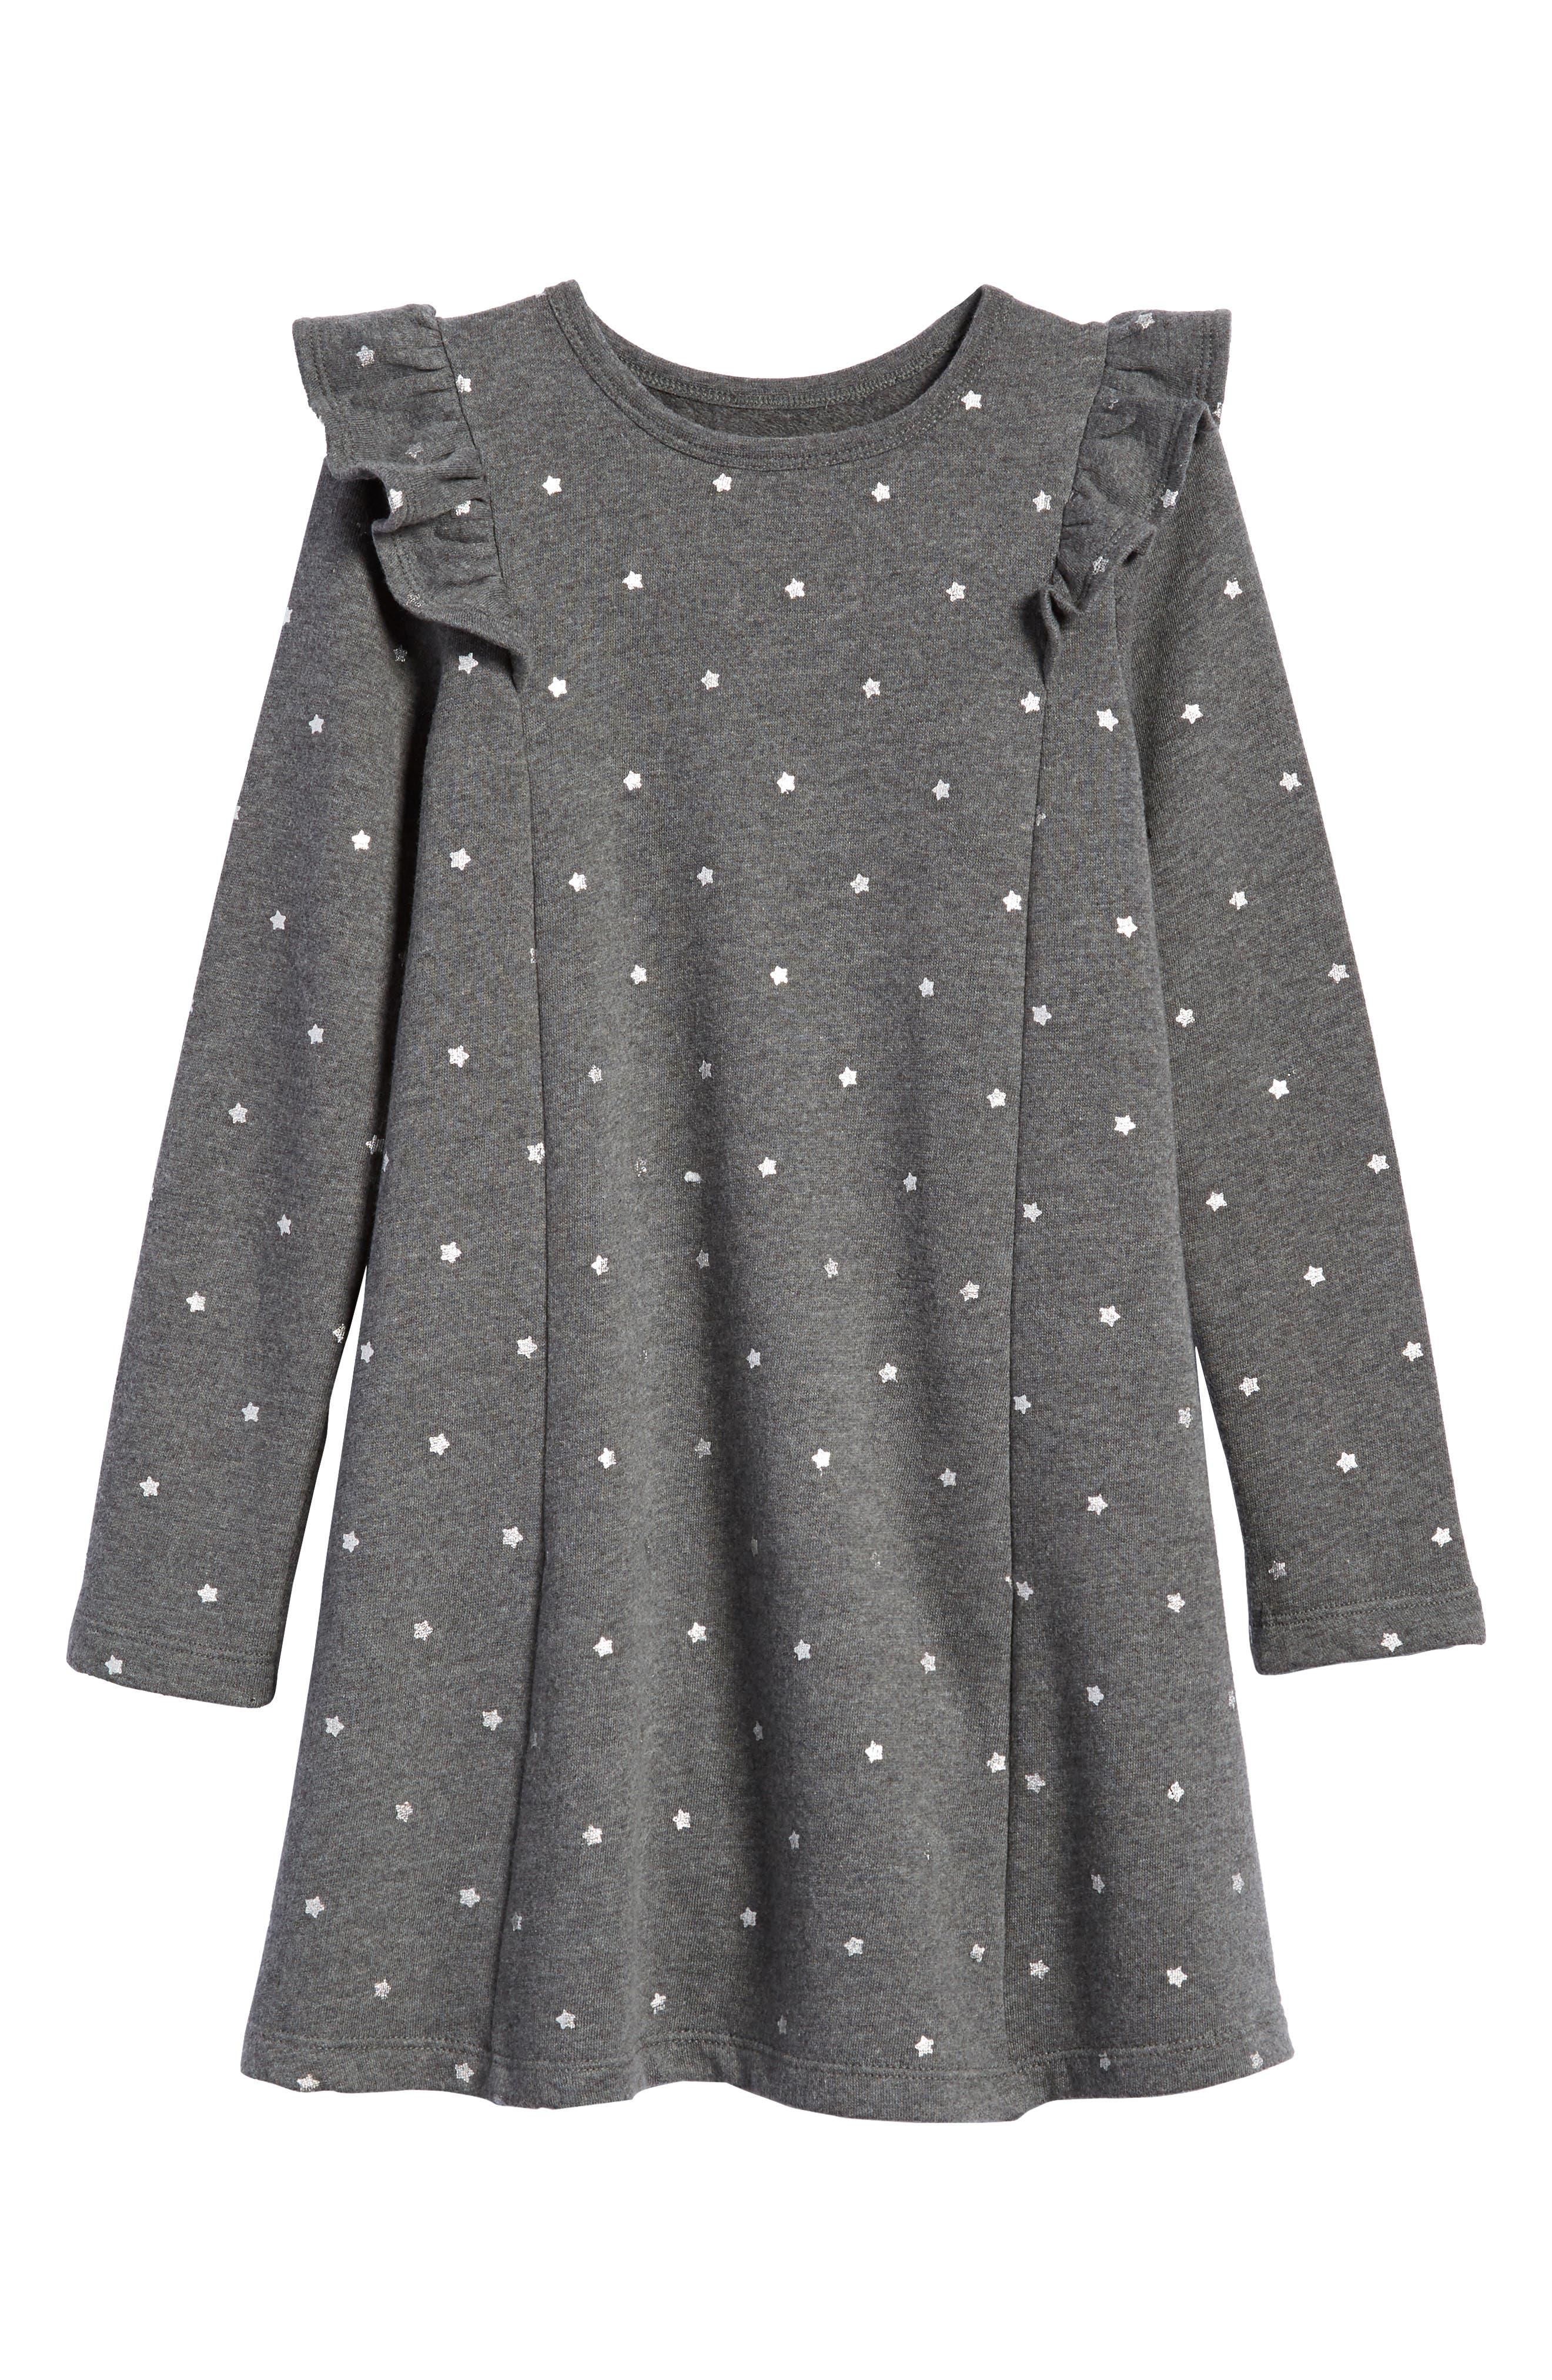 Ruffle Fleece Sweater Dress,                             Main thumbnail 1, color,                             GREY CHARCOAL HEATHER STARS